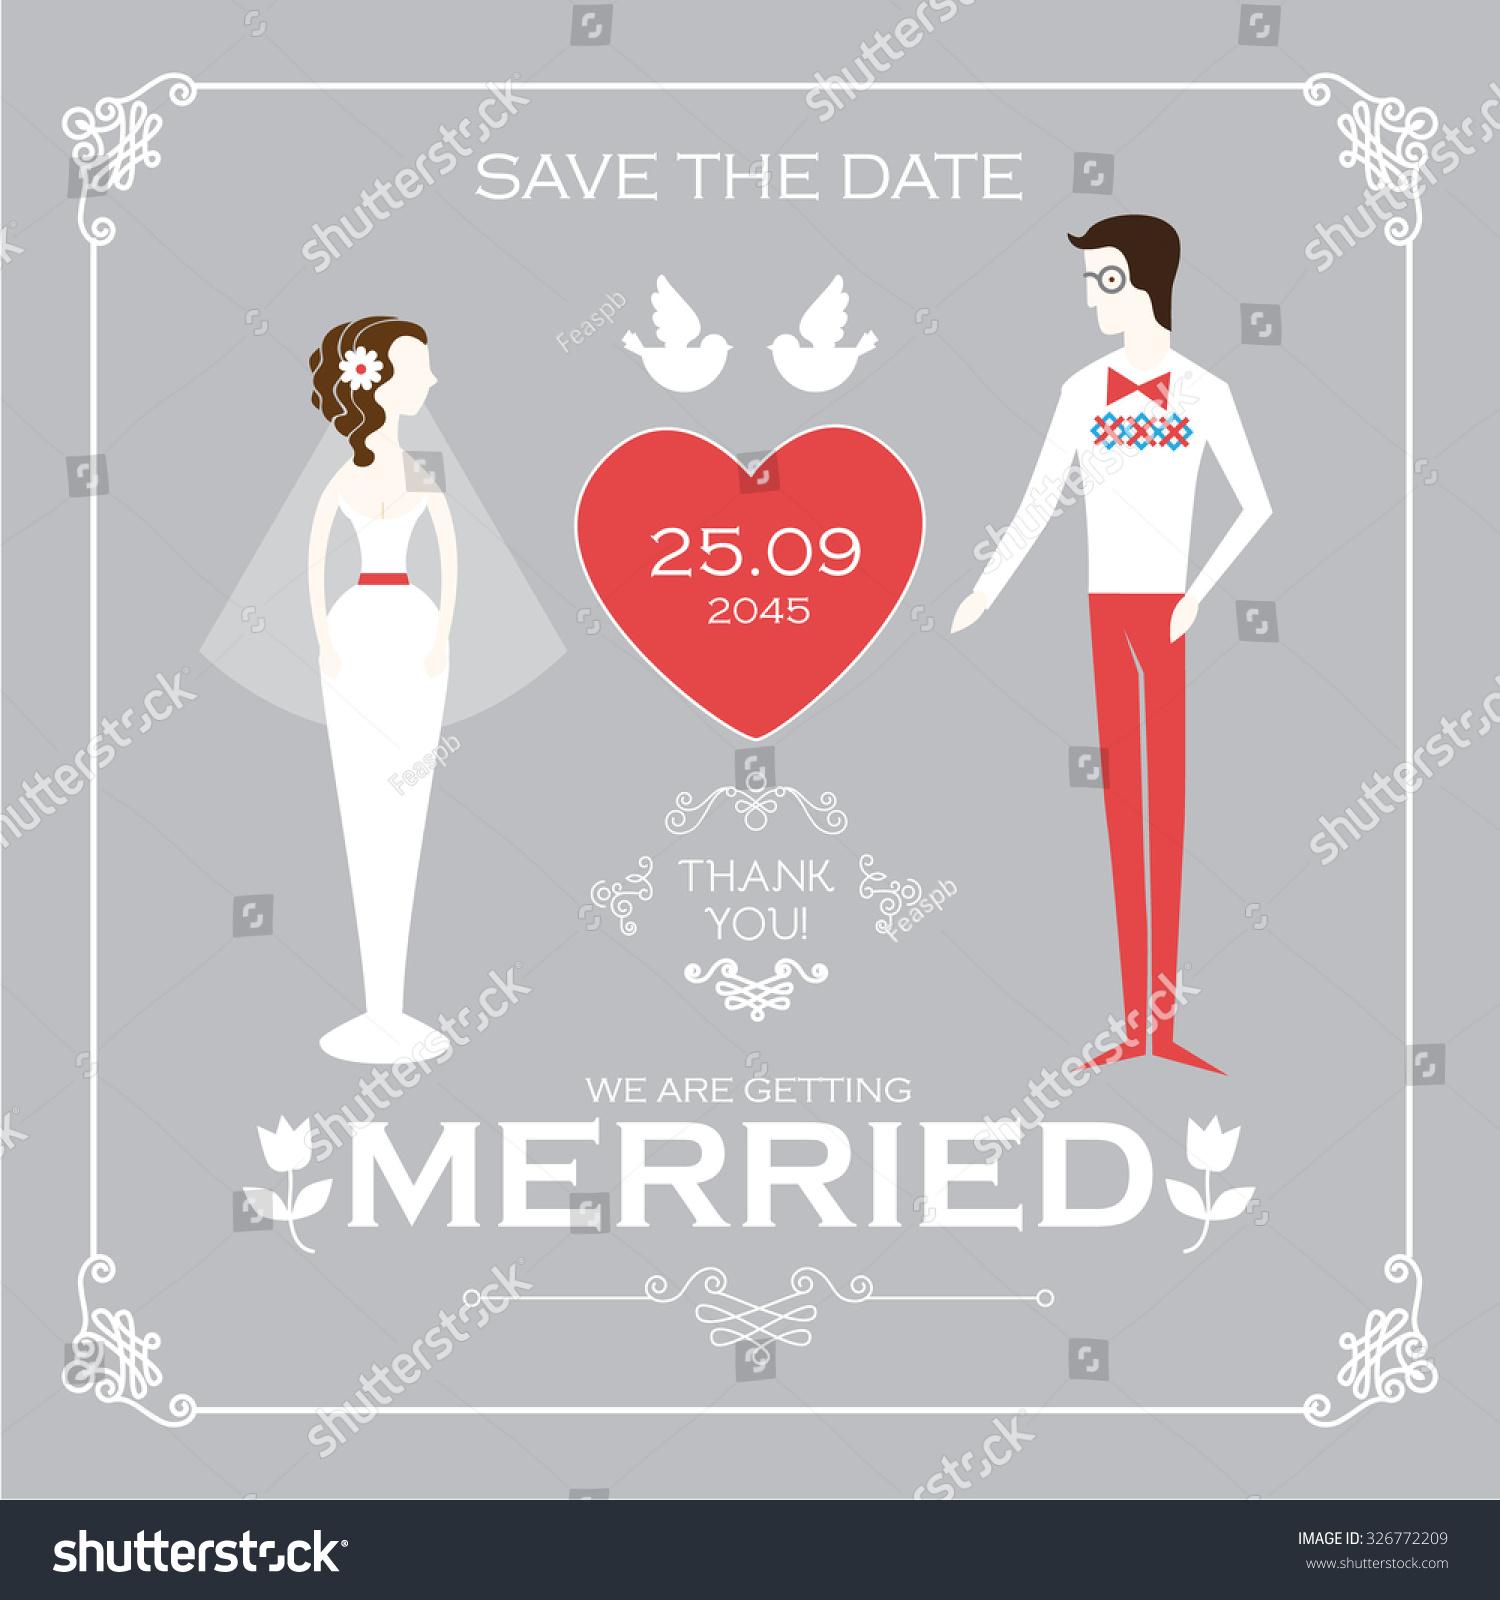 Vintage Wedding Invitation Card Template Groom Stock Vector (Royalty ...